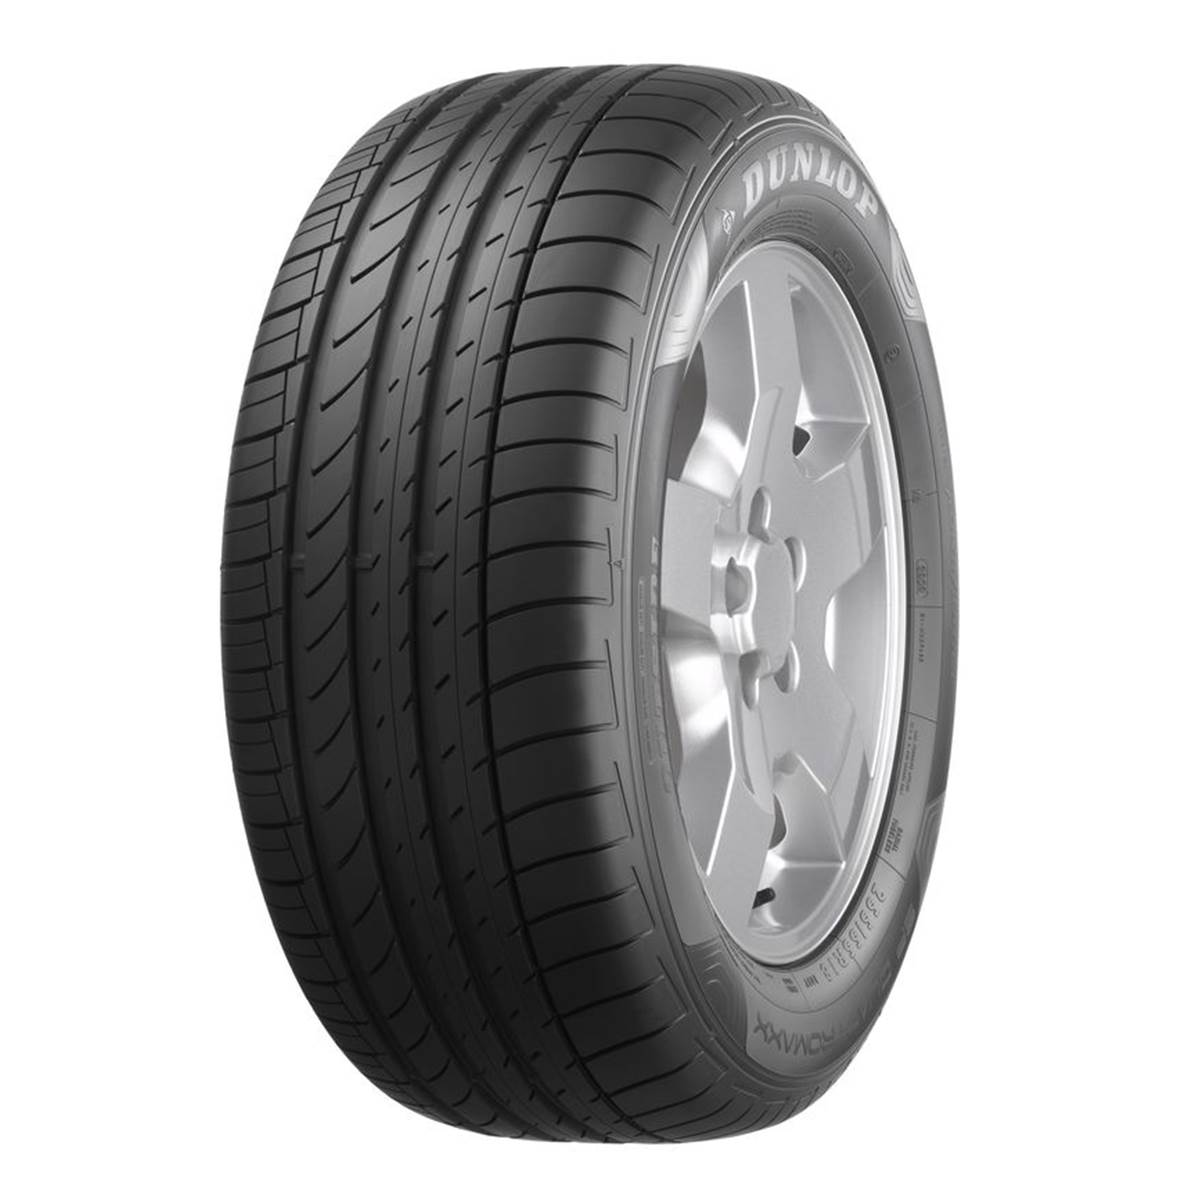 Pneu 4X4 Dunlop 275/40R20 106Y Sp Quattromaxx XL